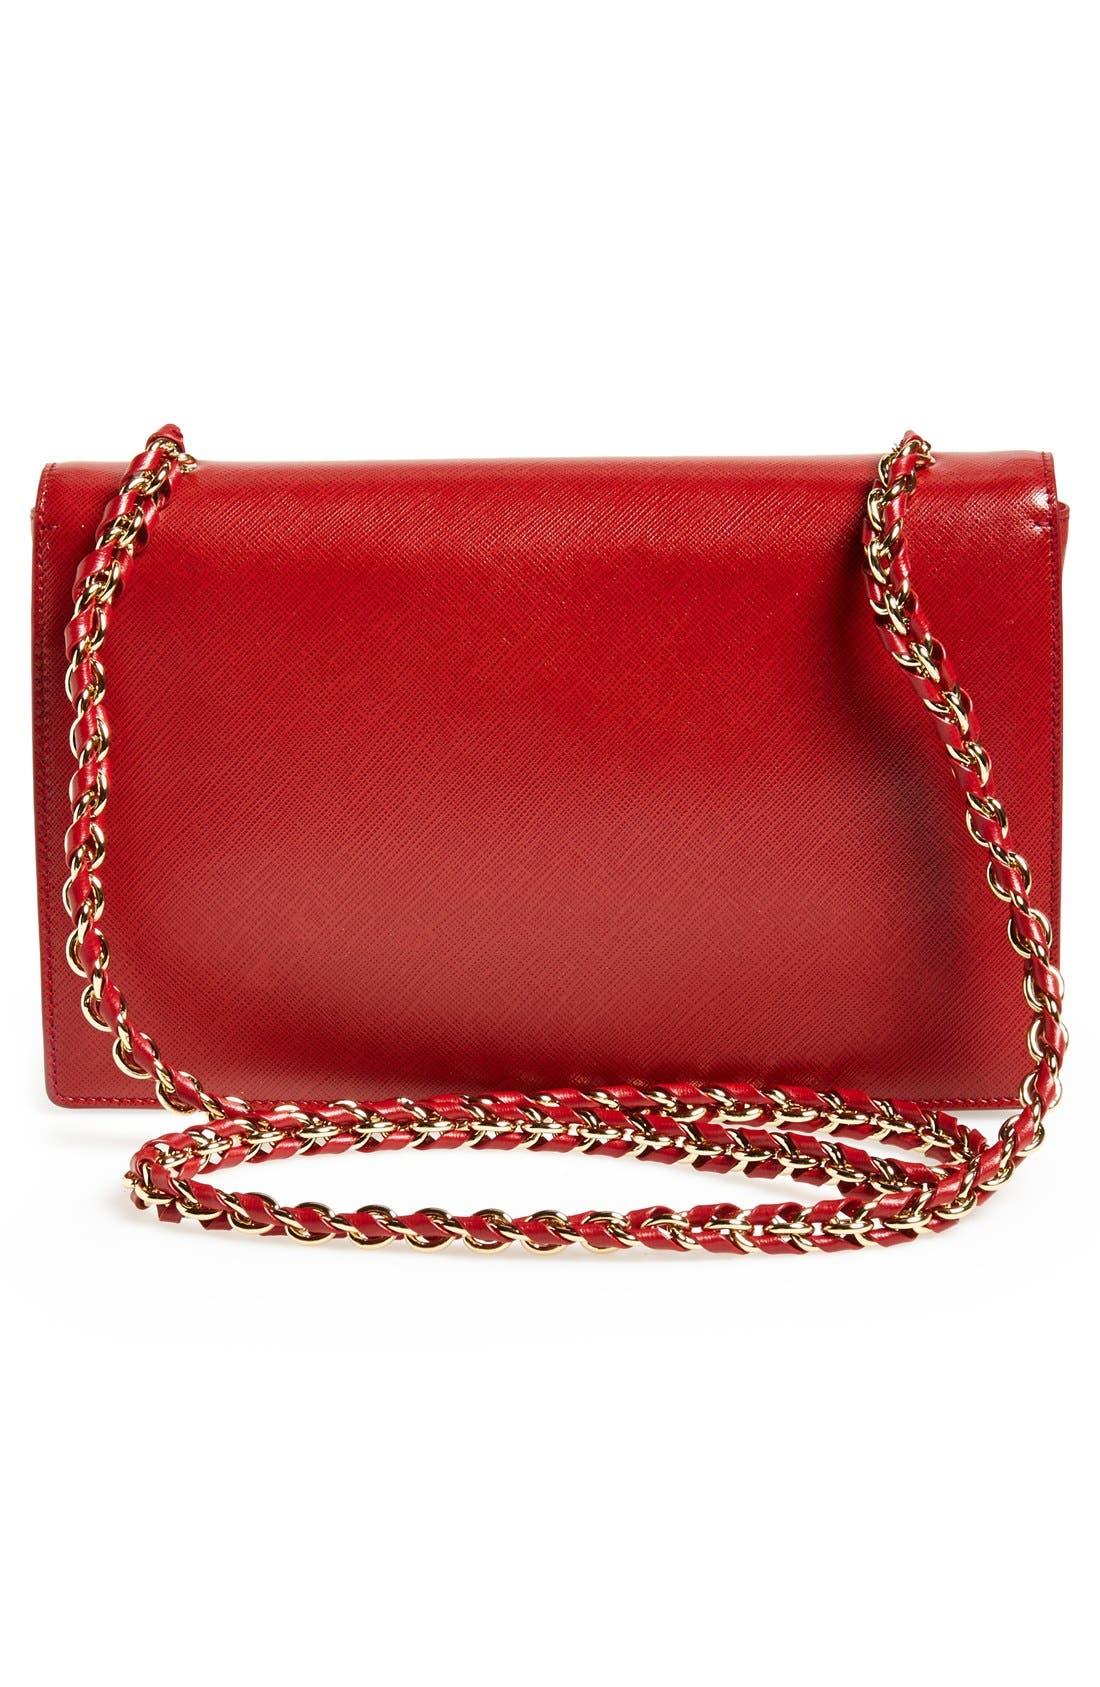 Saffiano Leather Shoulder Bag,                             Alternate thumbnail 12, color,